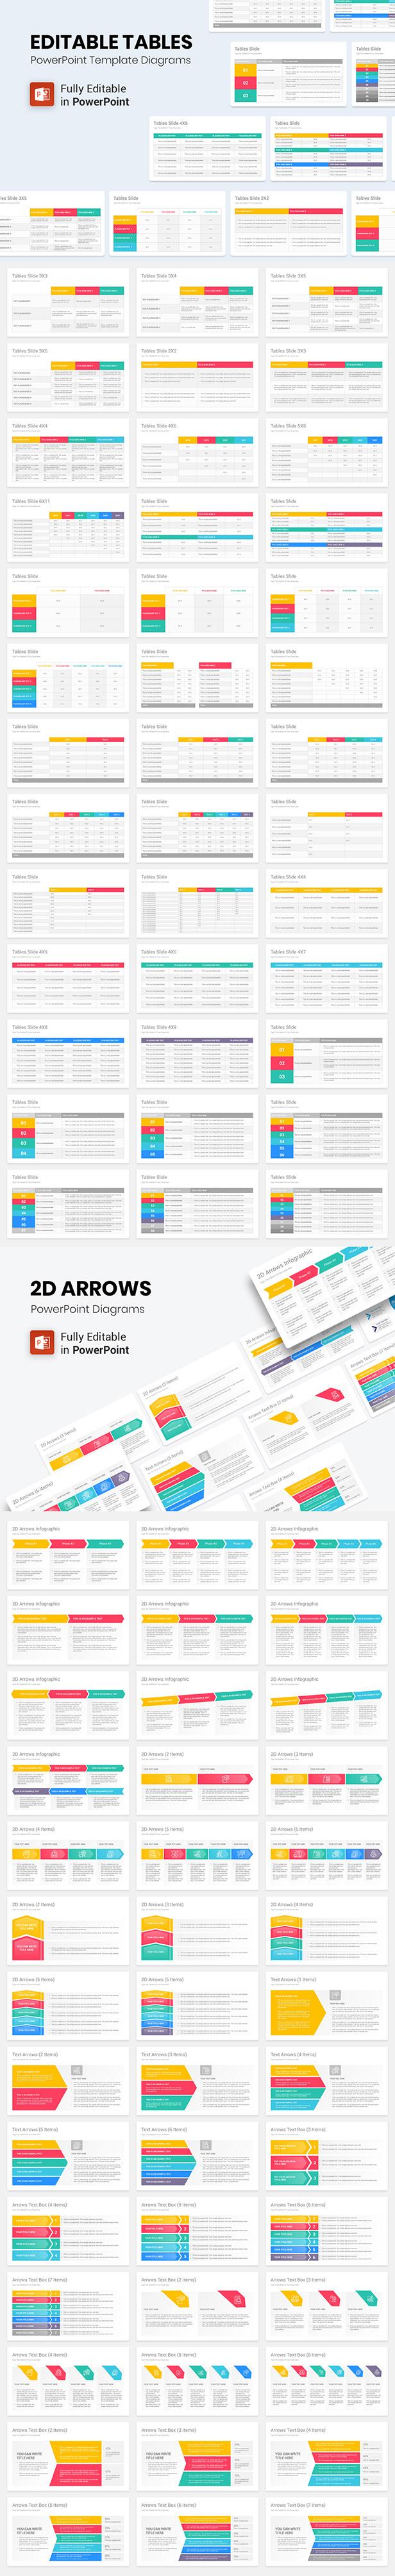 Slide Deck - Multipurpose PowerPoint Template - 14